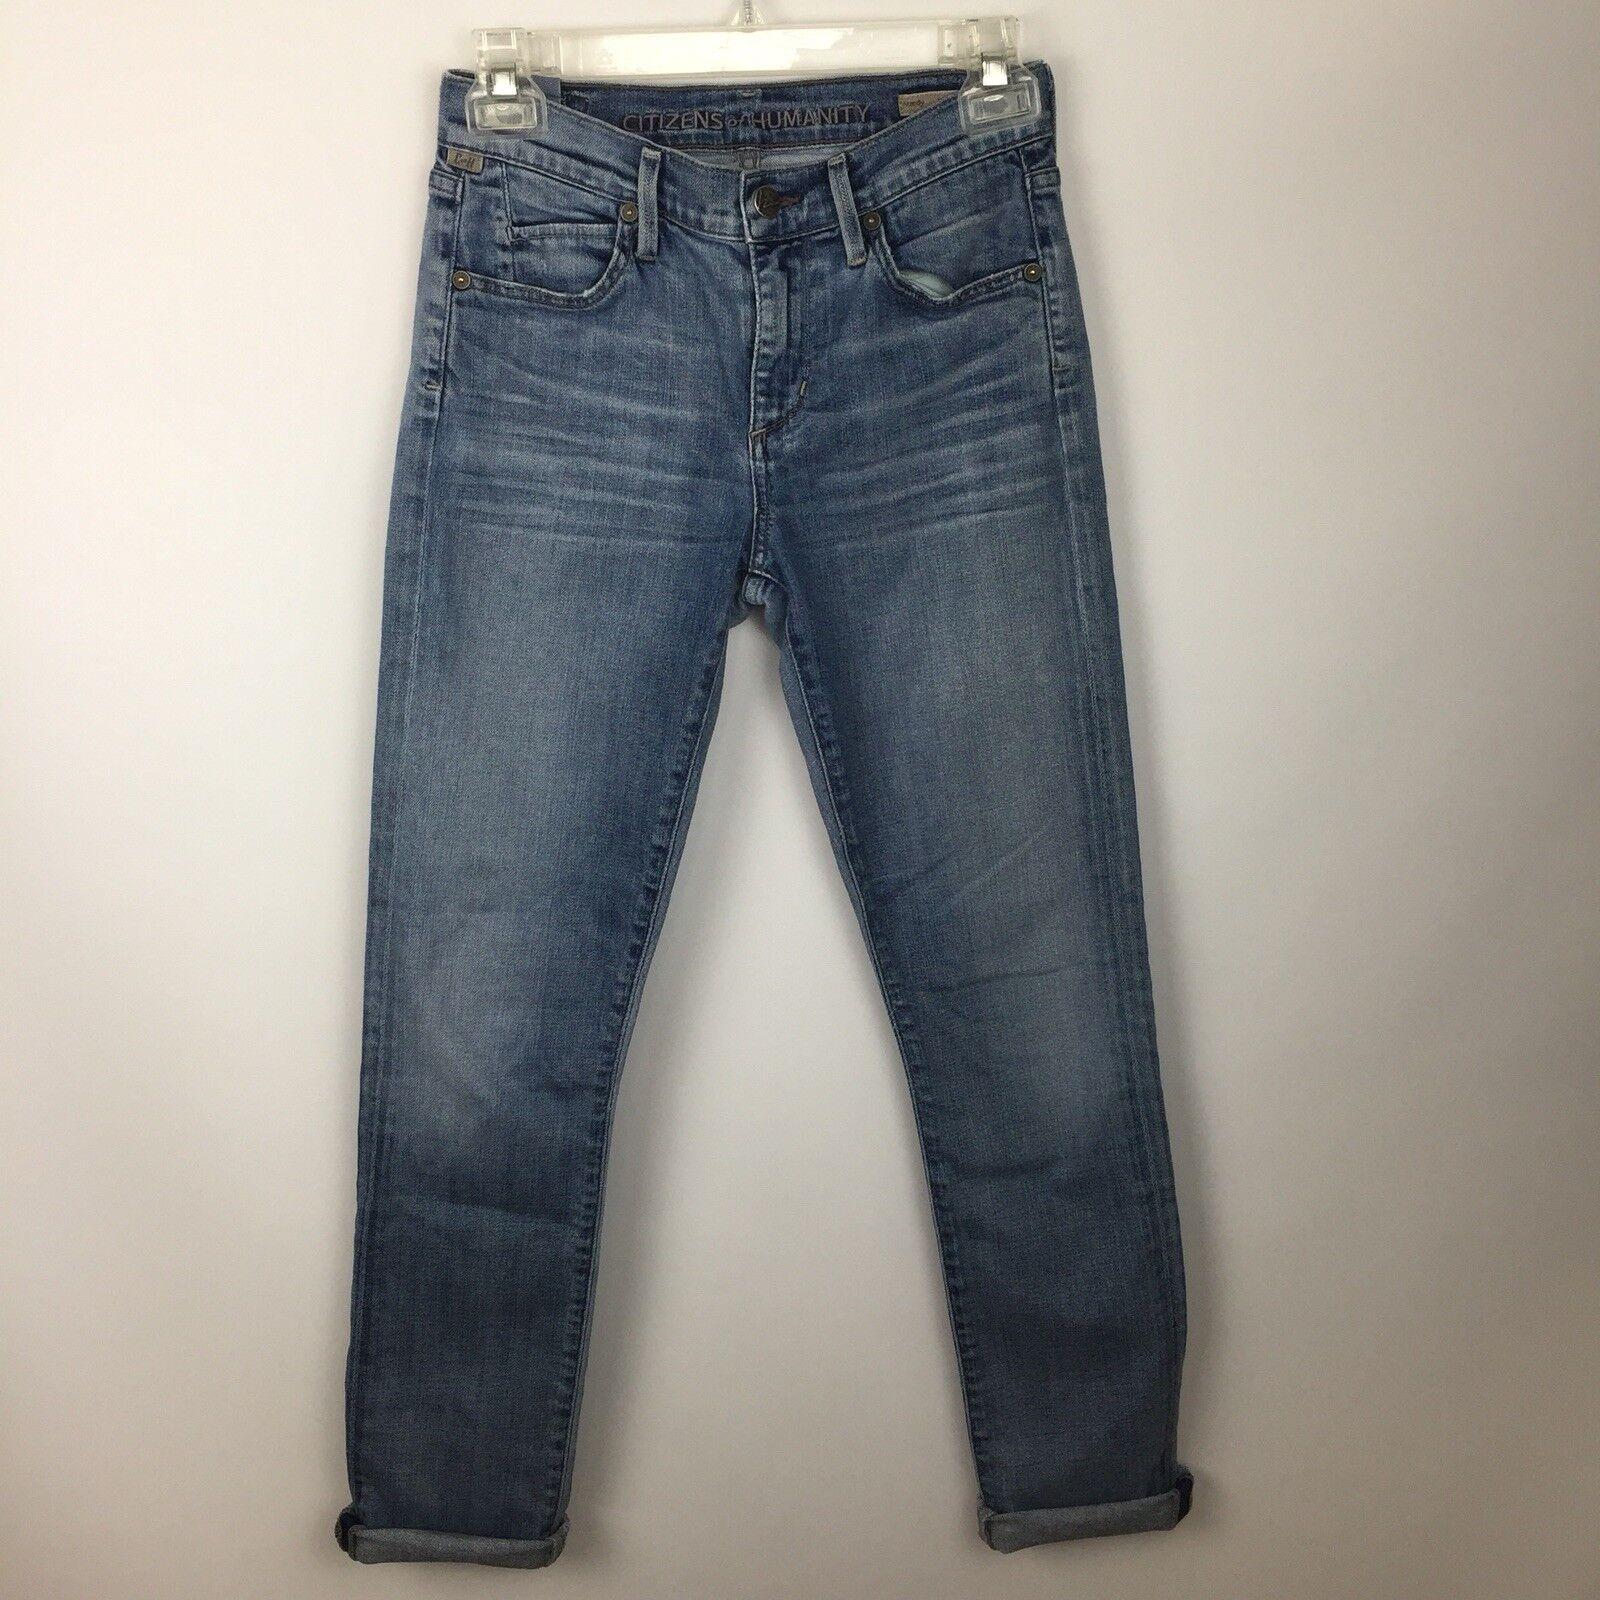 CITIZENS OF HUMANITY Womens Sz 25 Mandy High Waist Retro Slim Jeans Crystal Wash